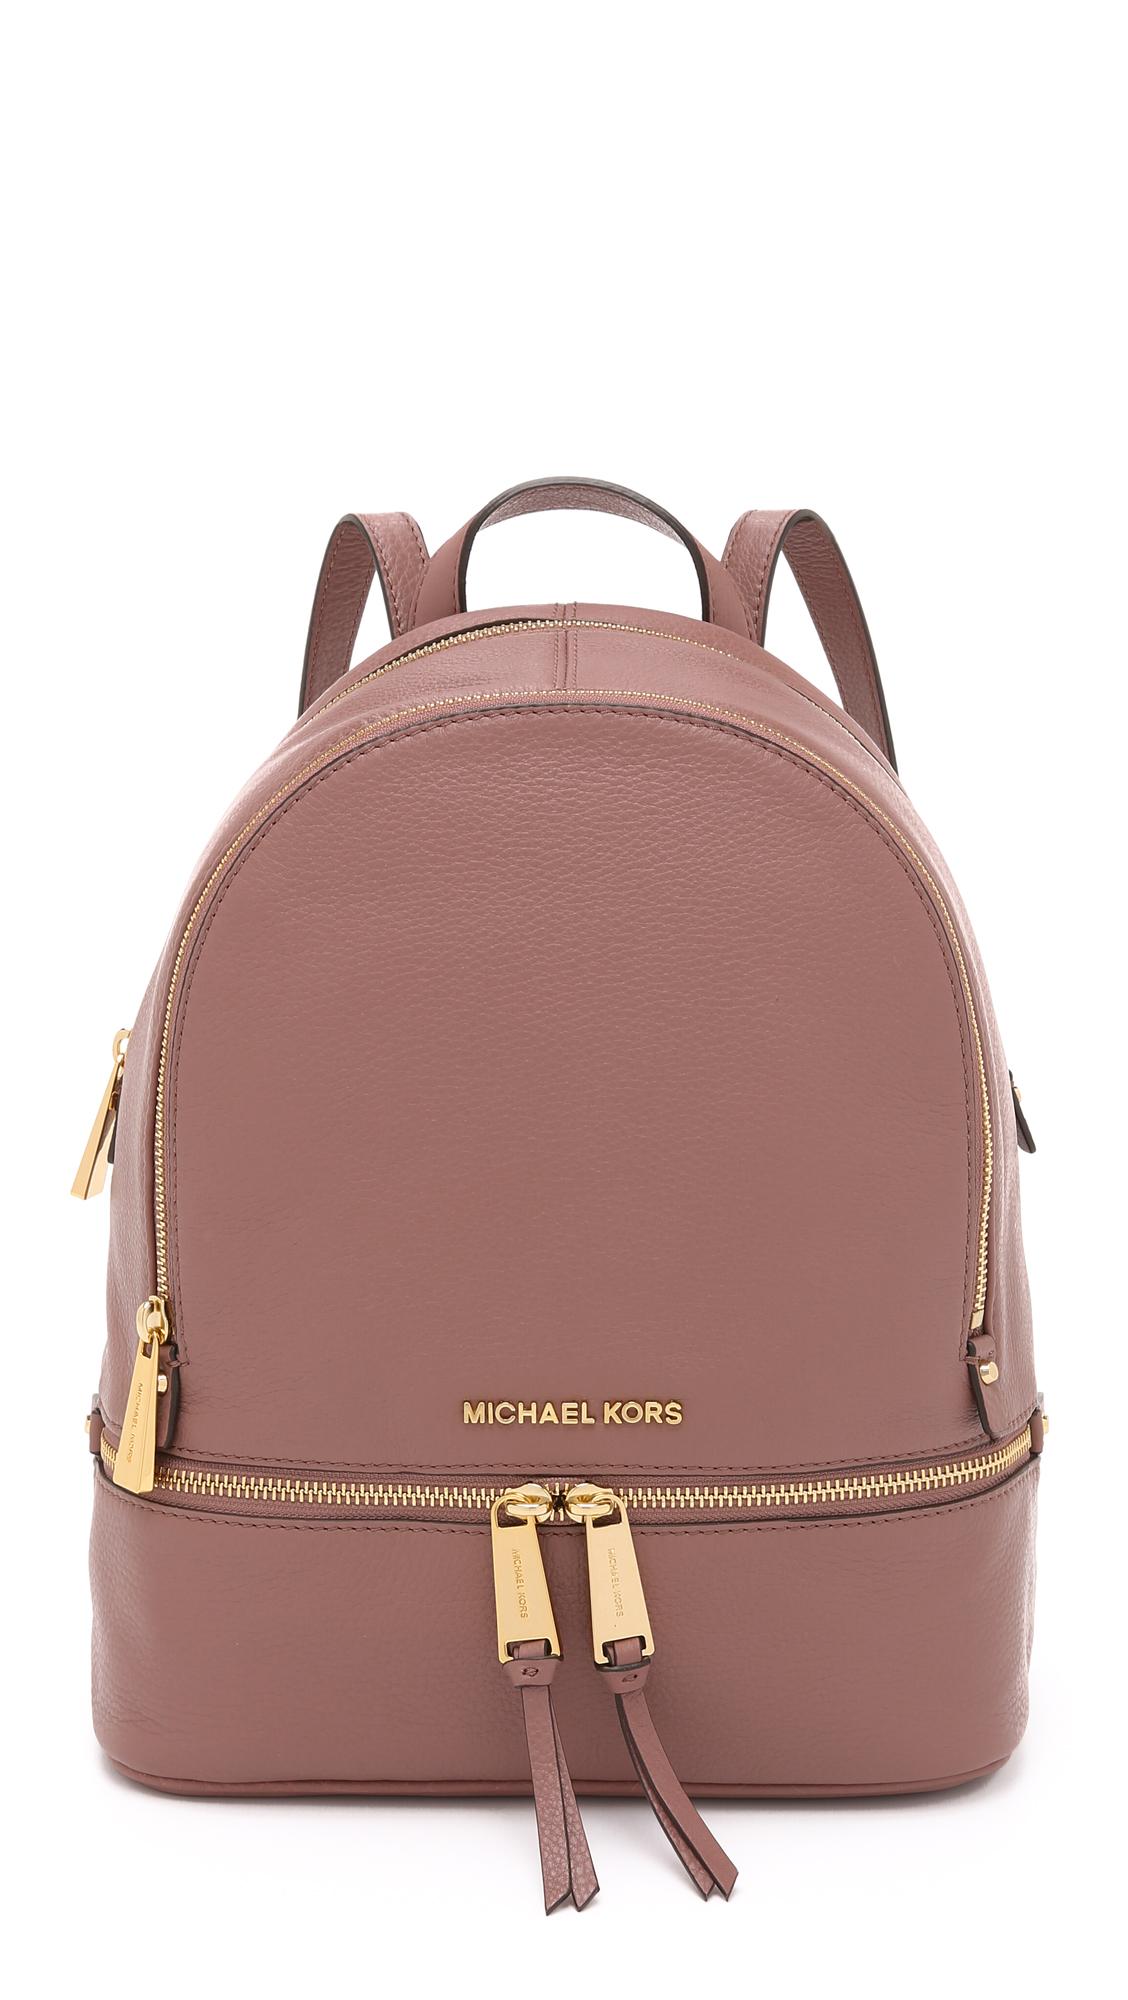 ef0a8ffecac1 Buy michael kors backpack rhea   OFF44% Discounted